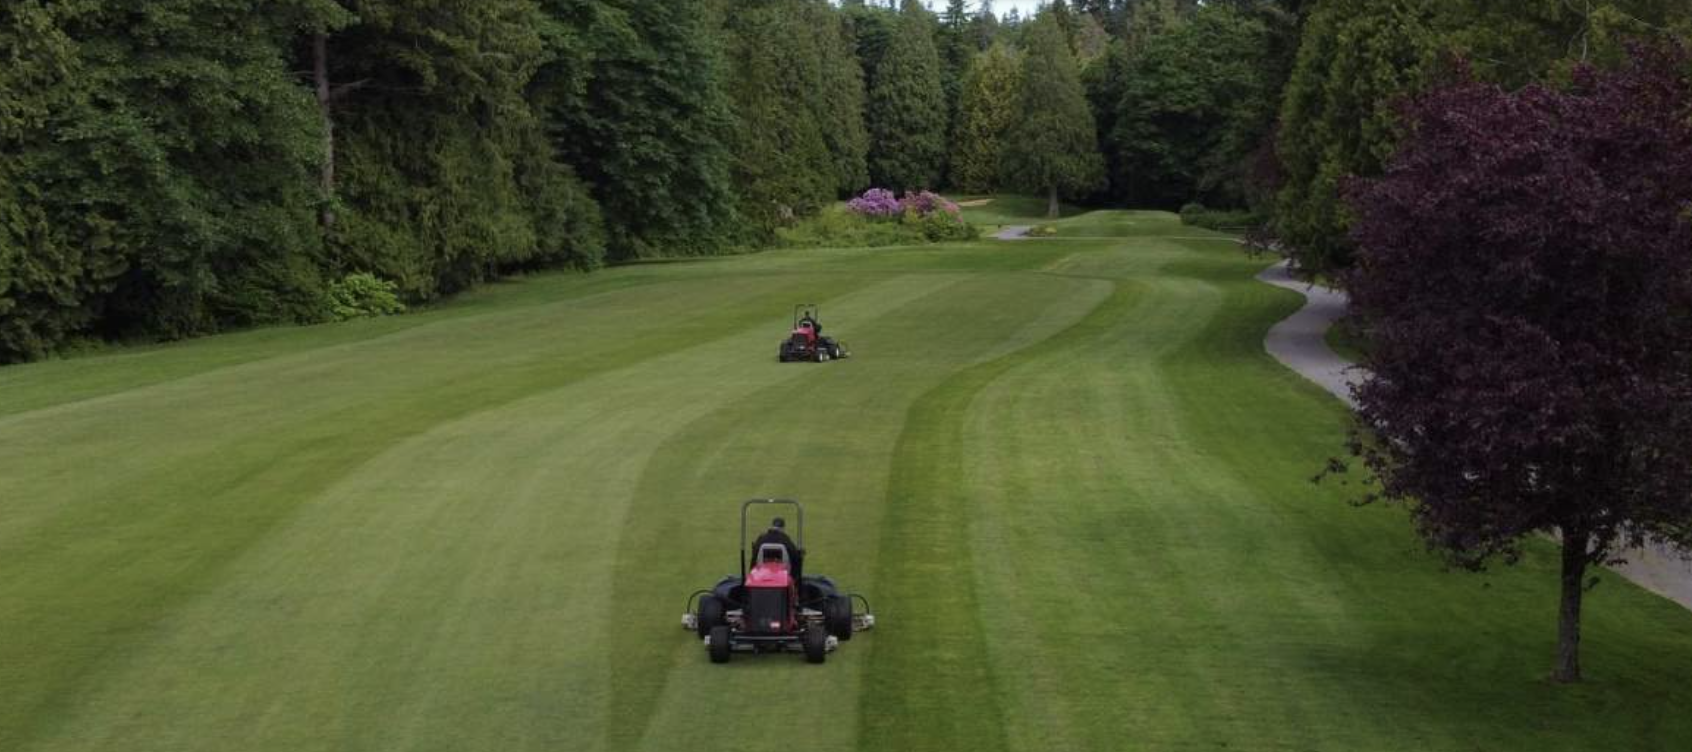 2. Shaughnessy Golf & Country Club